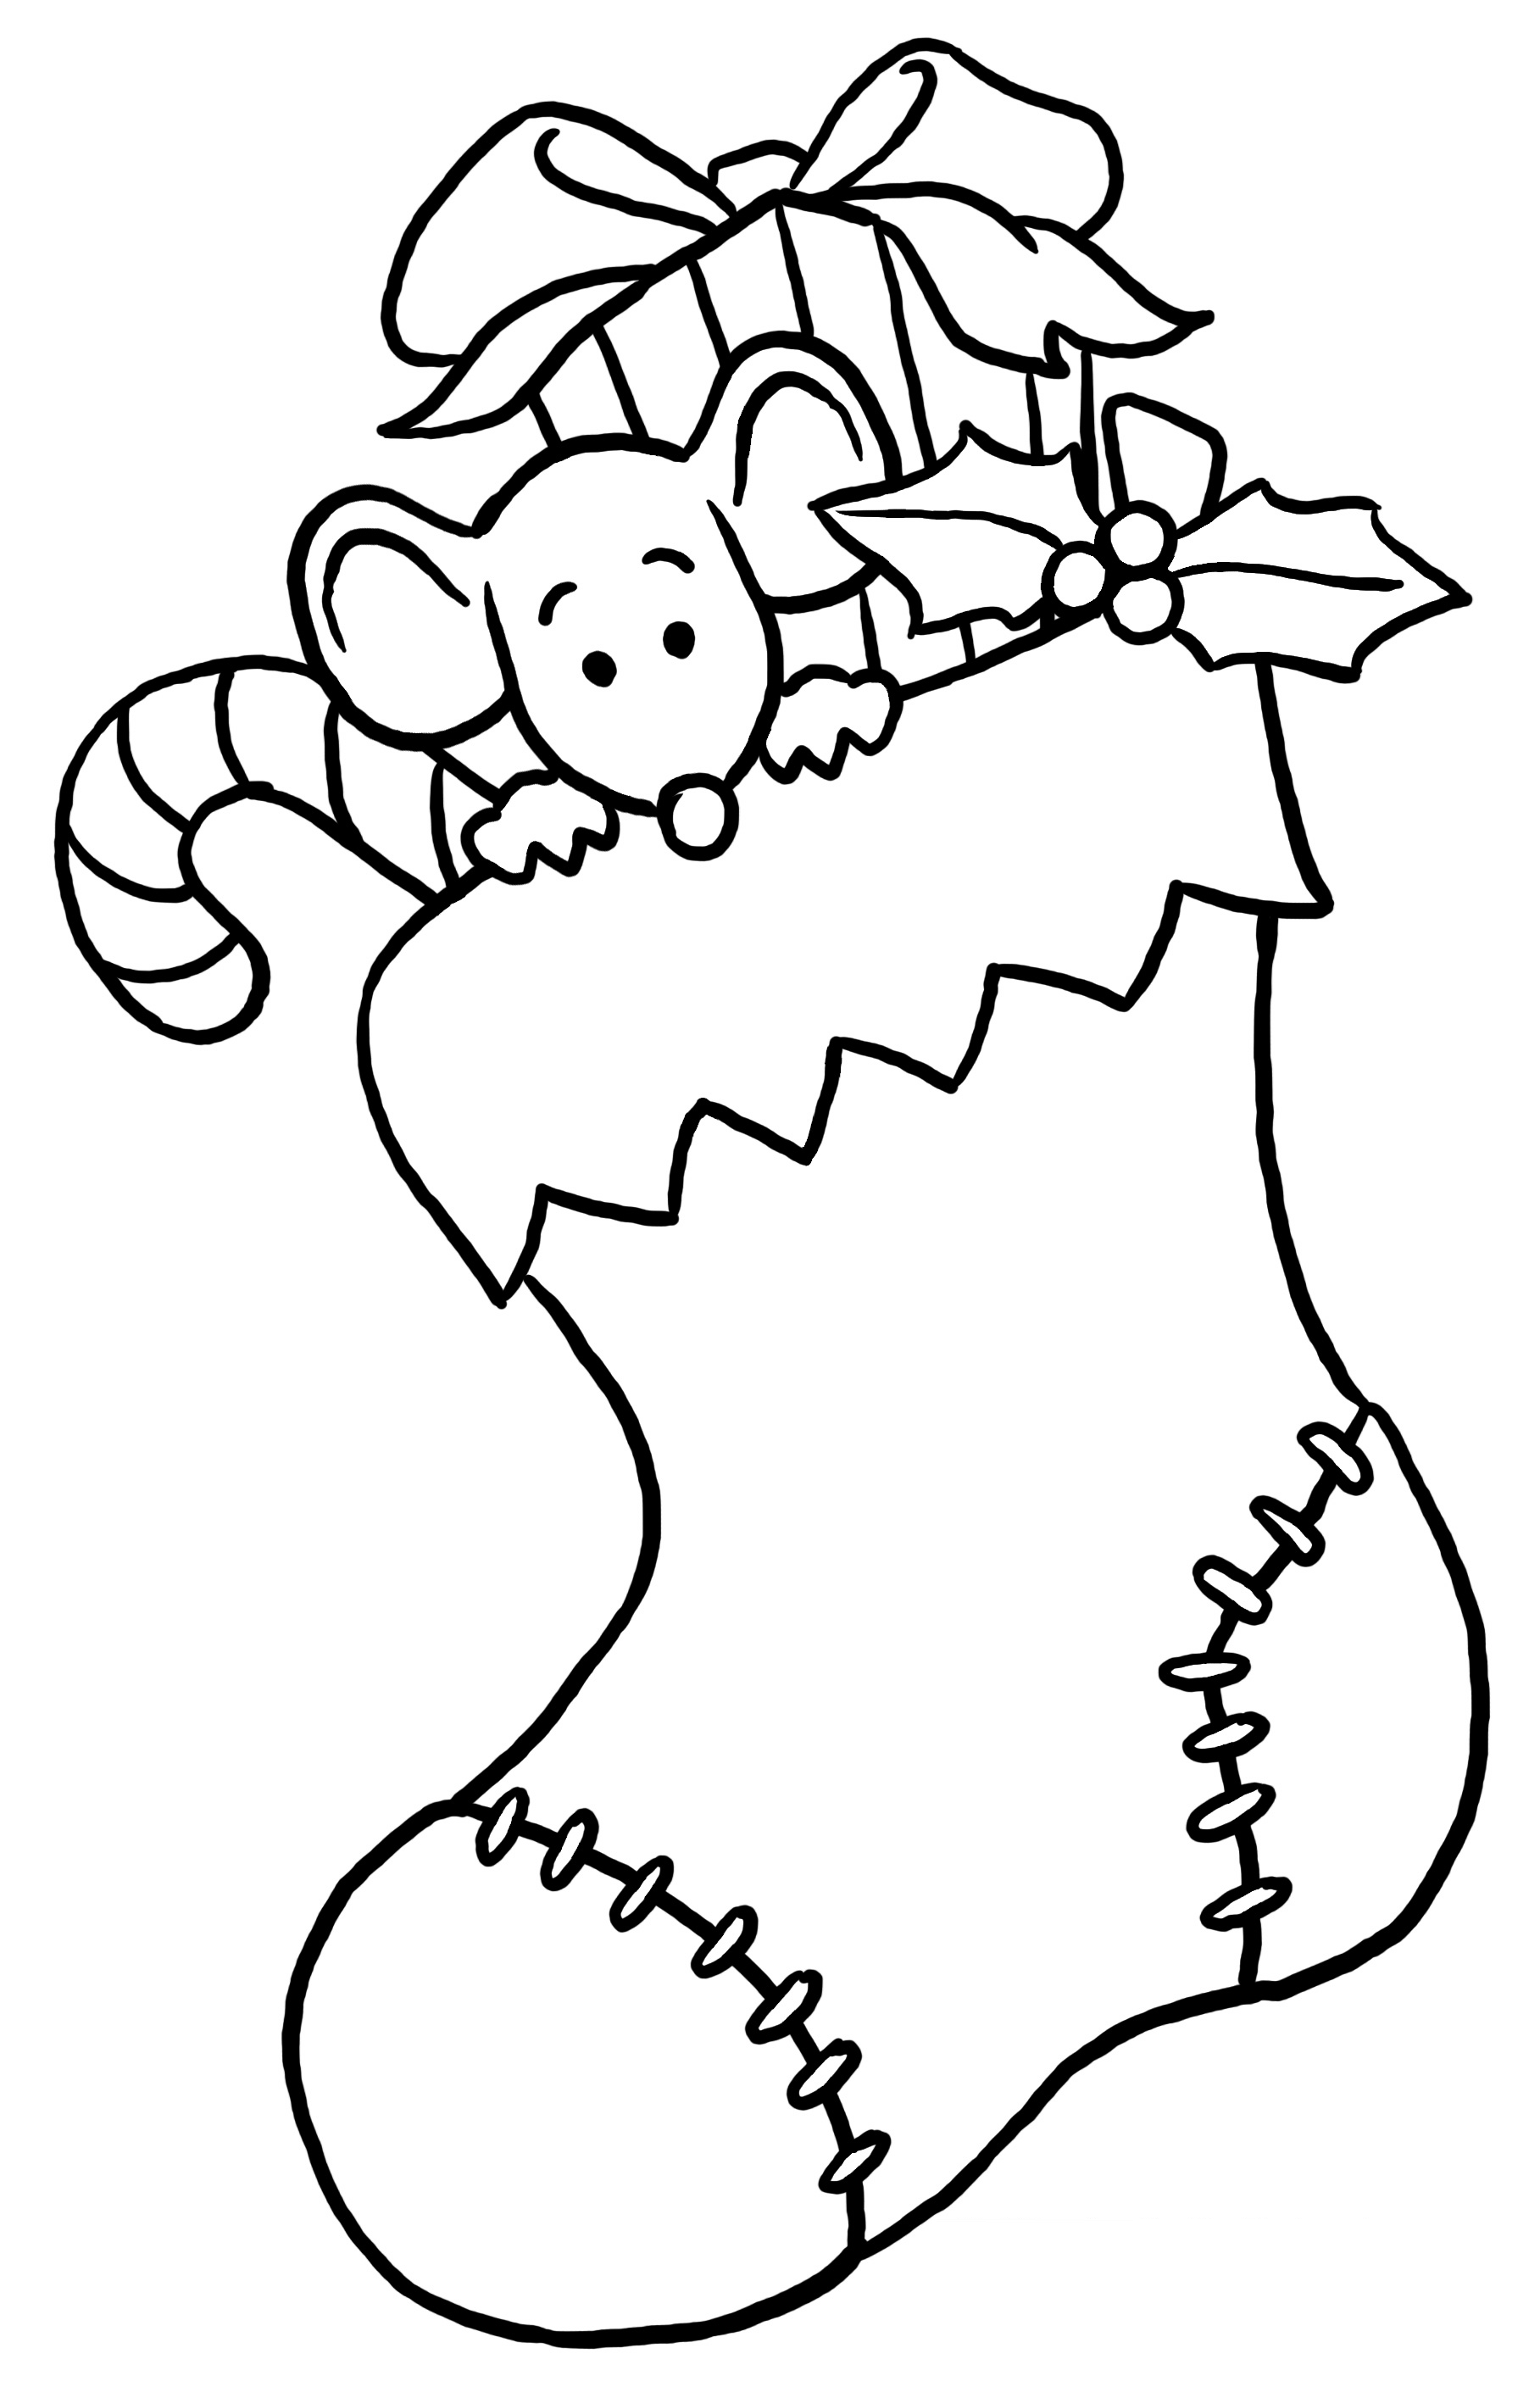 Free xmas coloring pages printable - Christmas Coloring Page Print Coloring Pages For All Ages